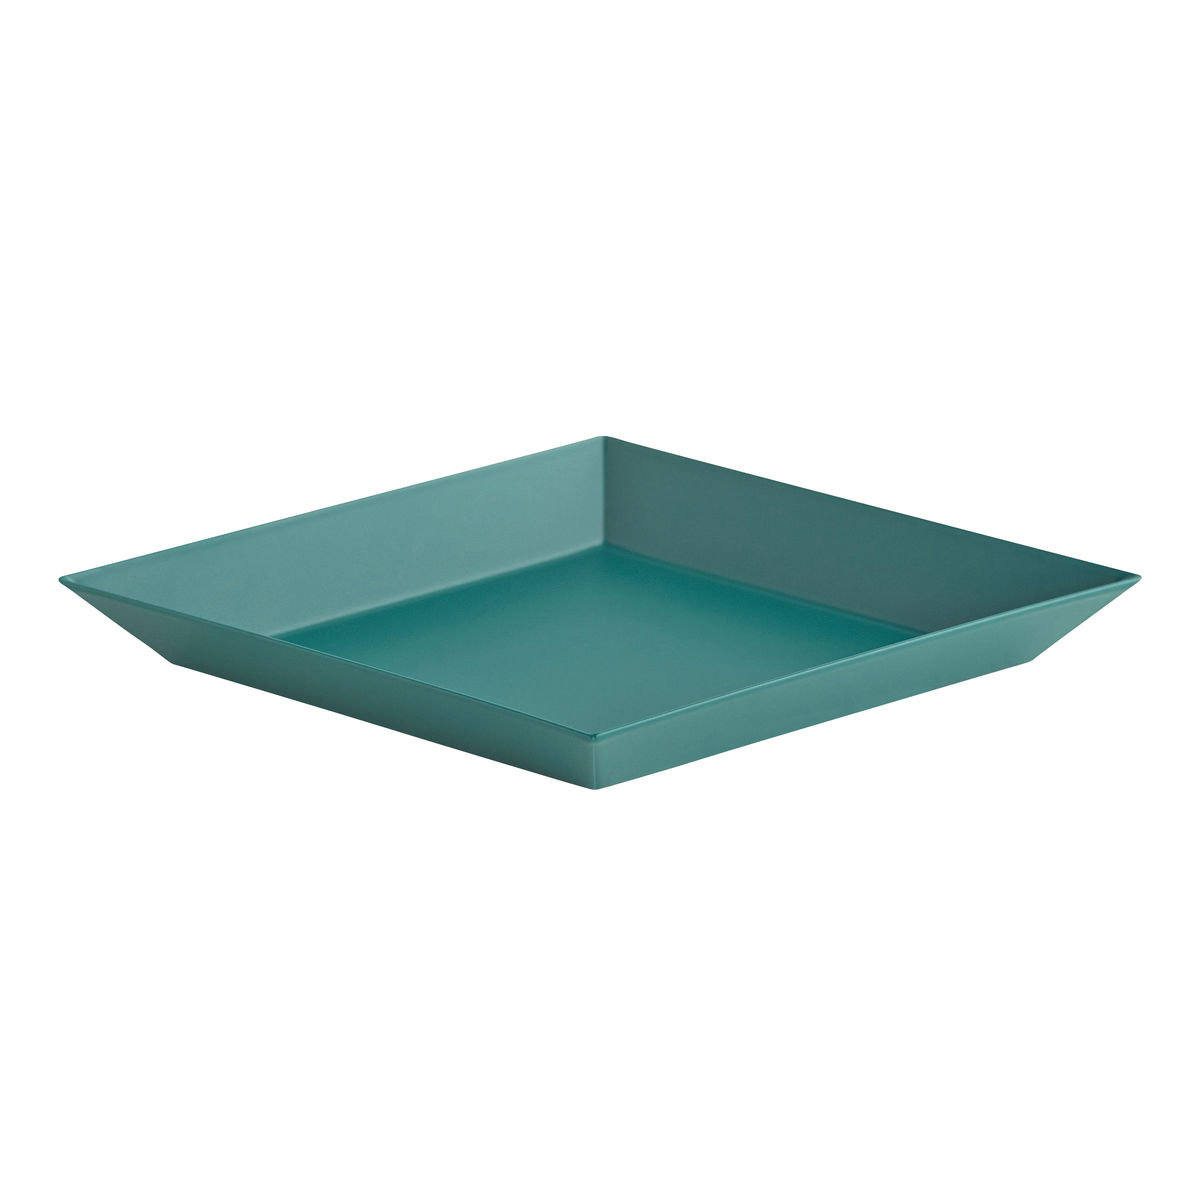 kaleido xs tray hay. Black Bedroom Furniture Sets. Home Design Ideas